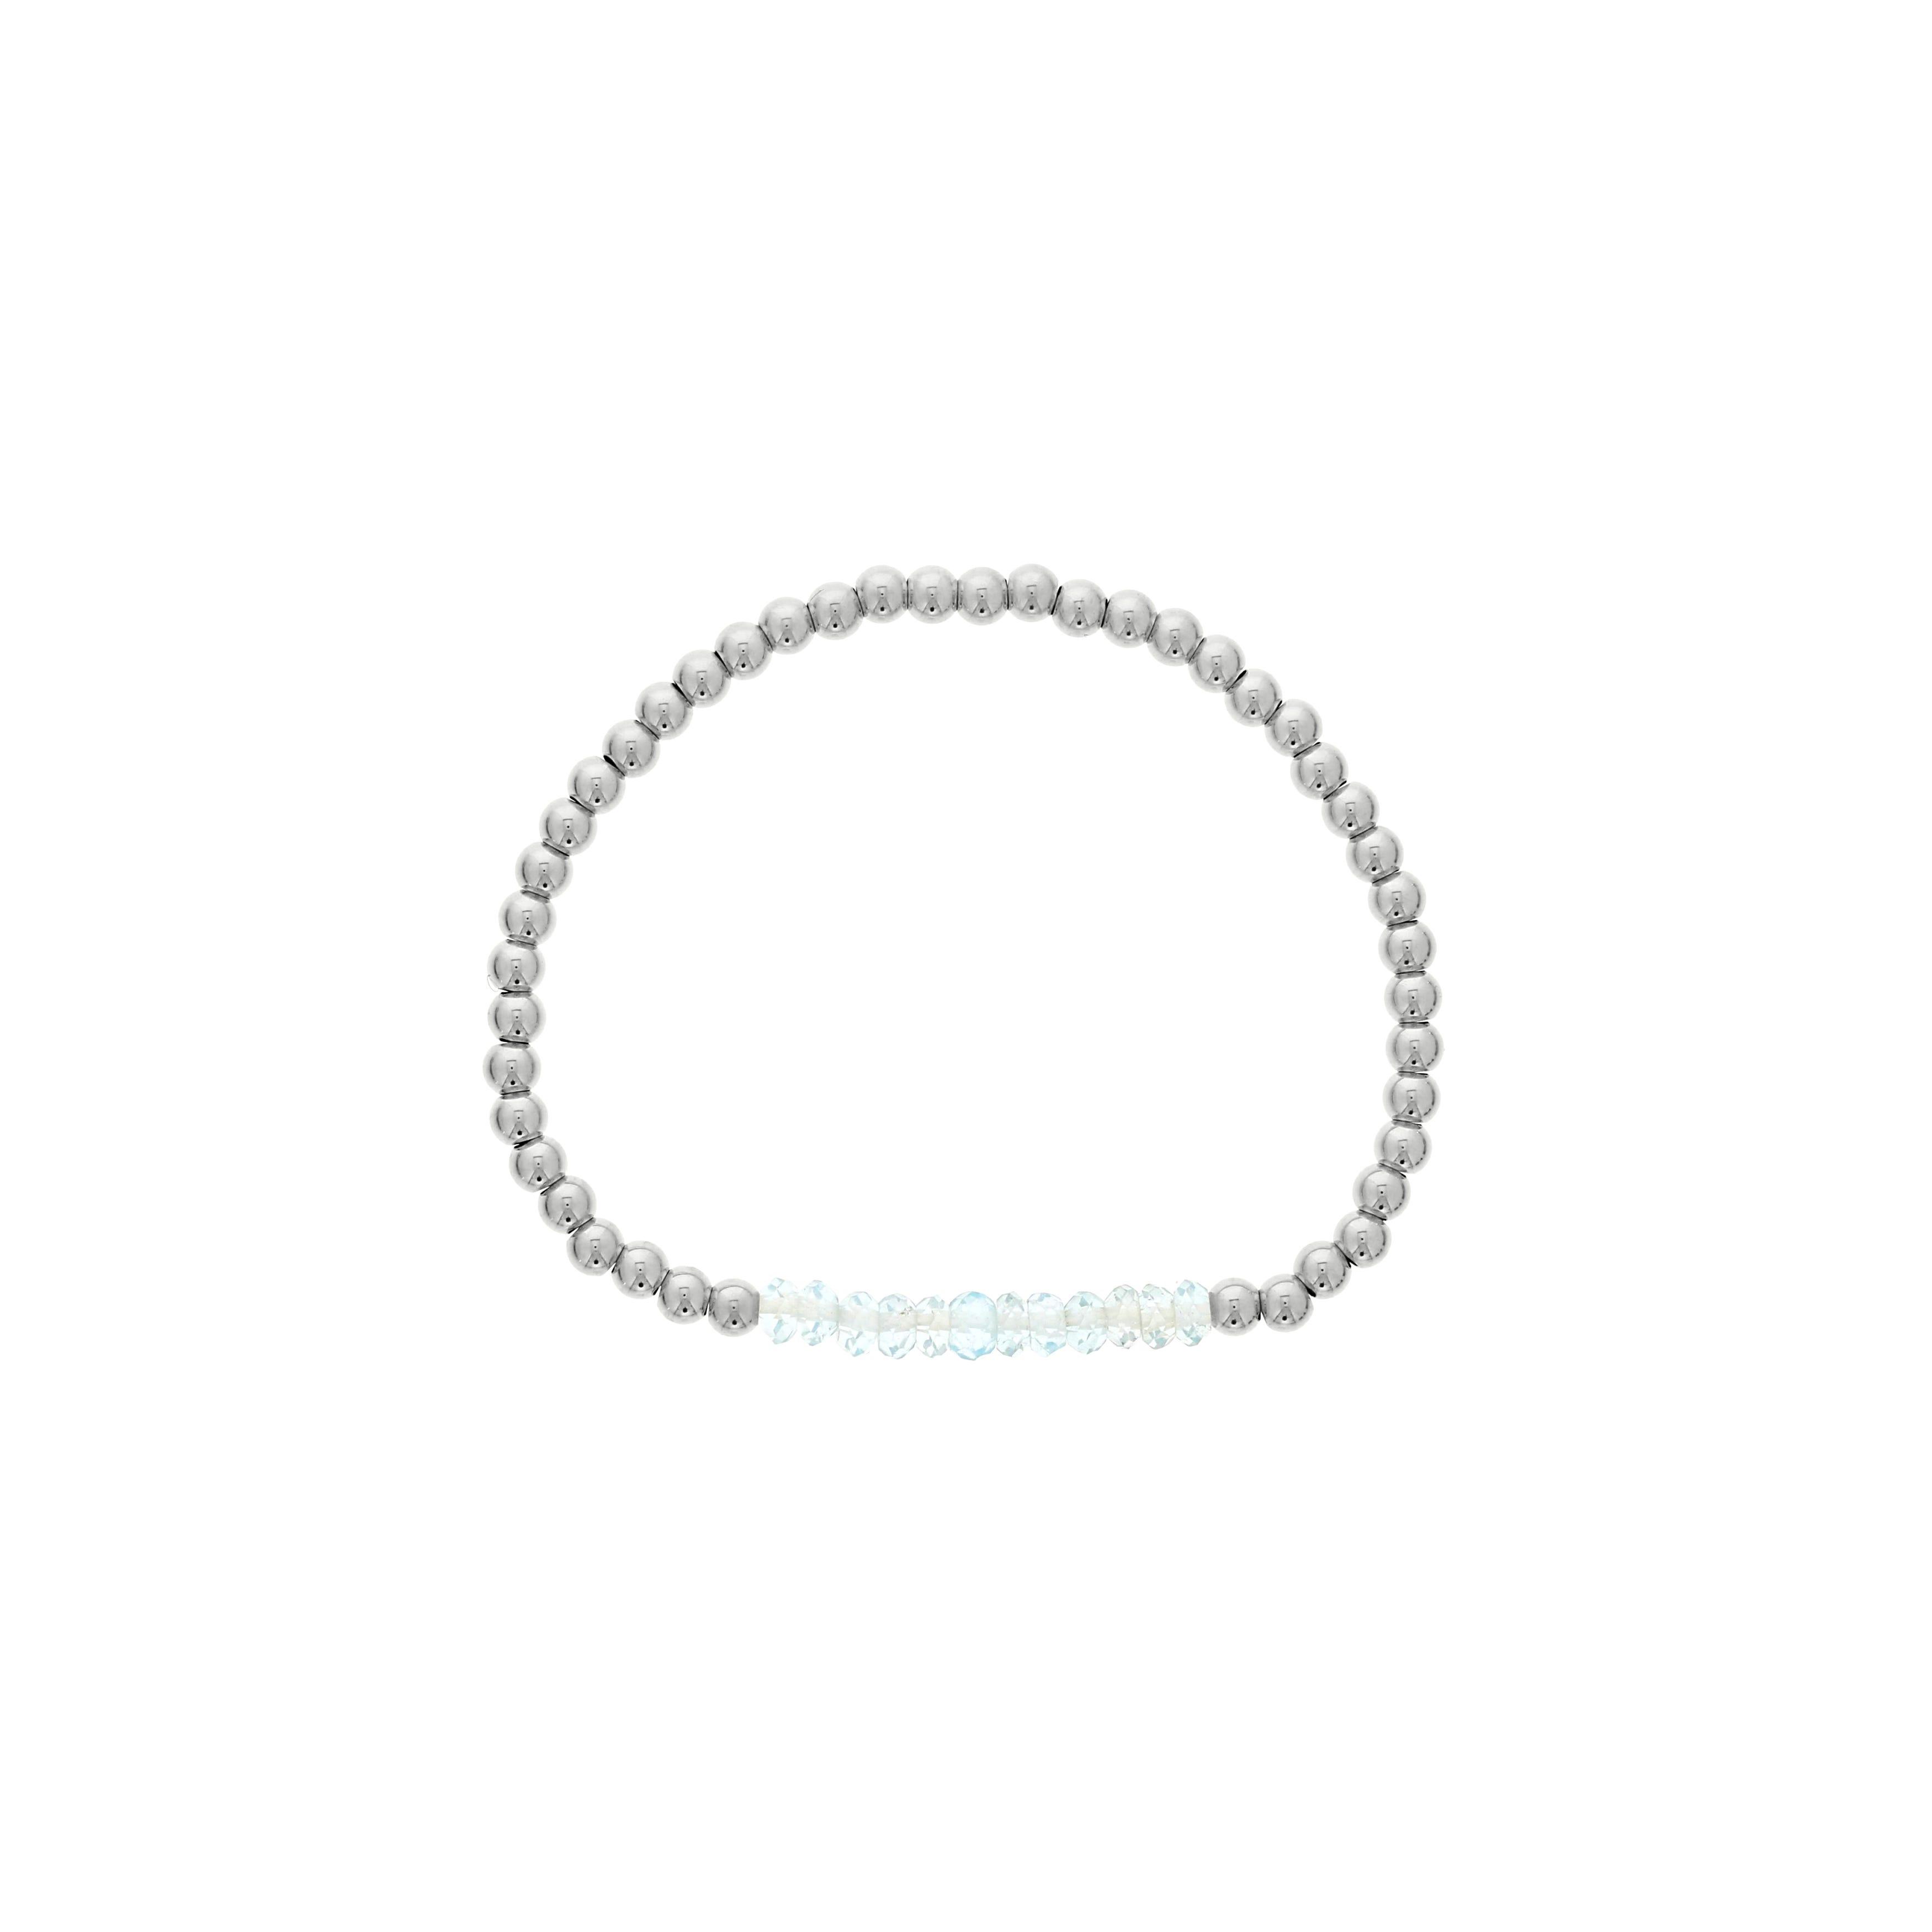 Blue Topaz Birthstone Beaded Bracelet in Sterling Silver